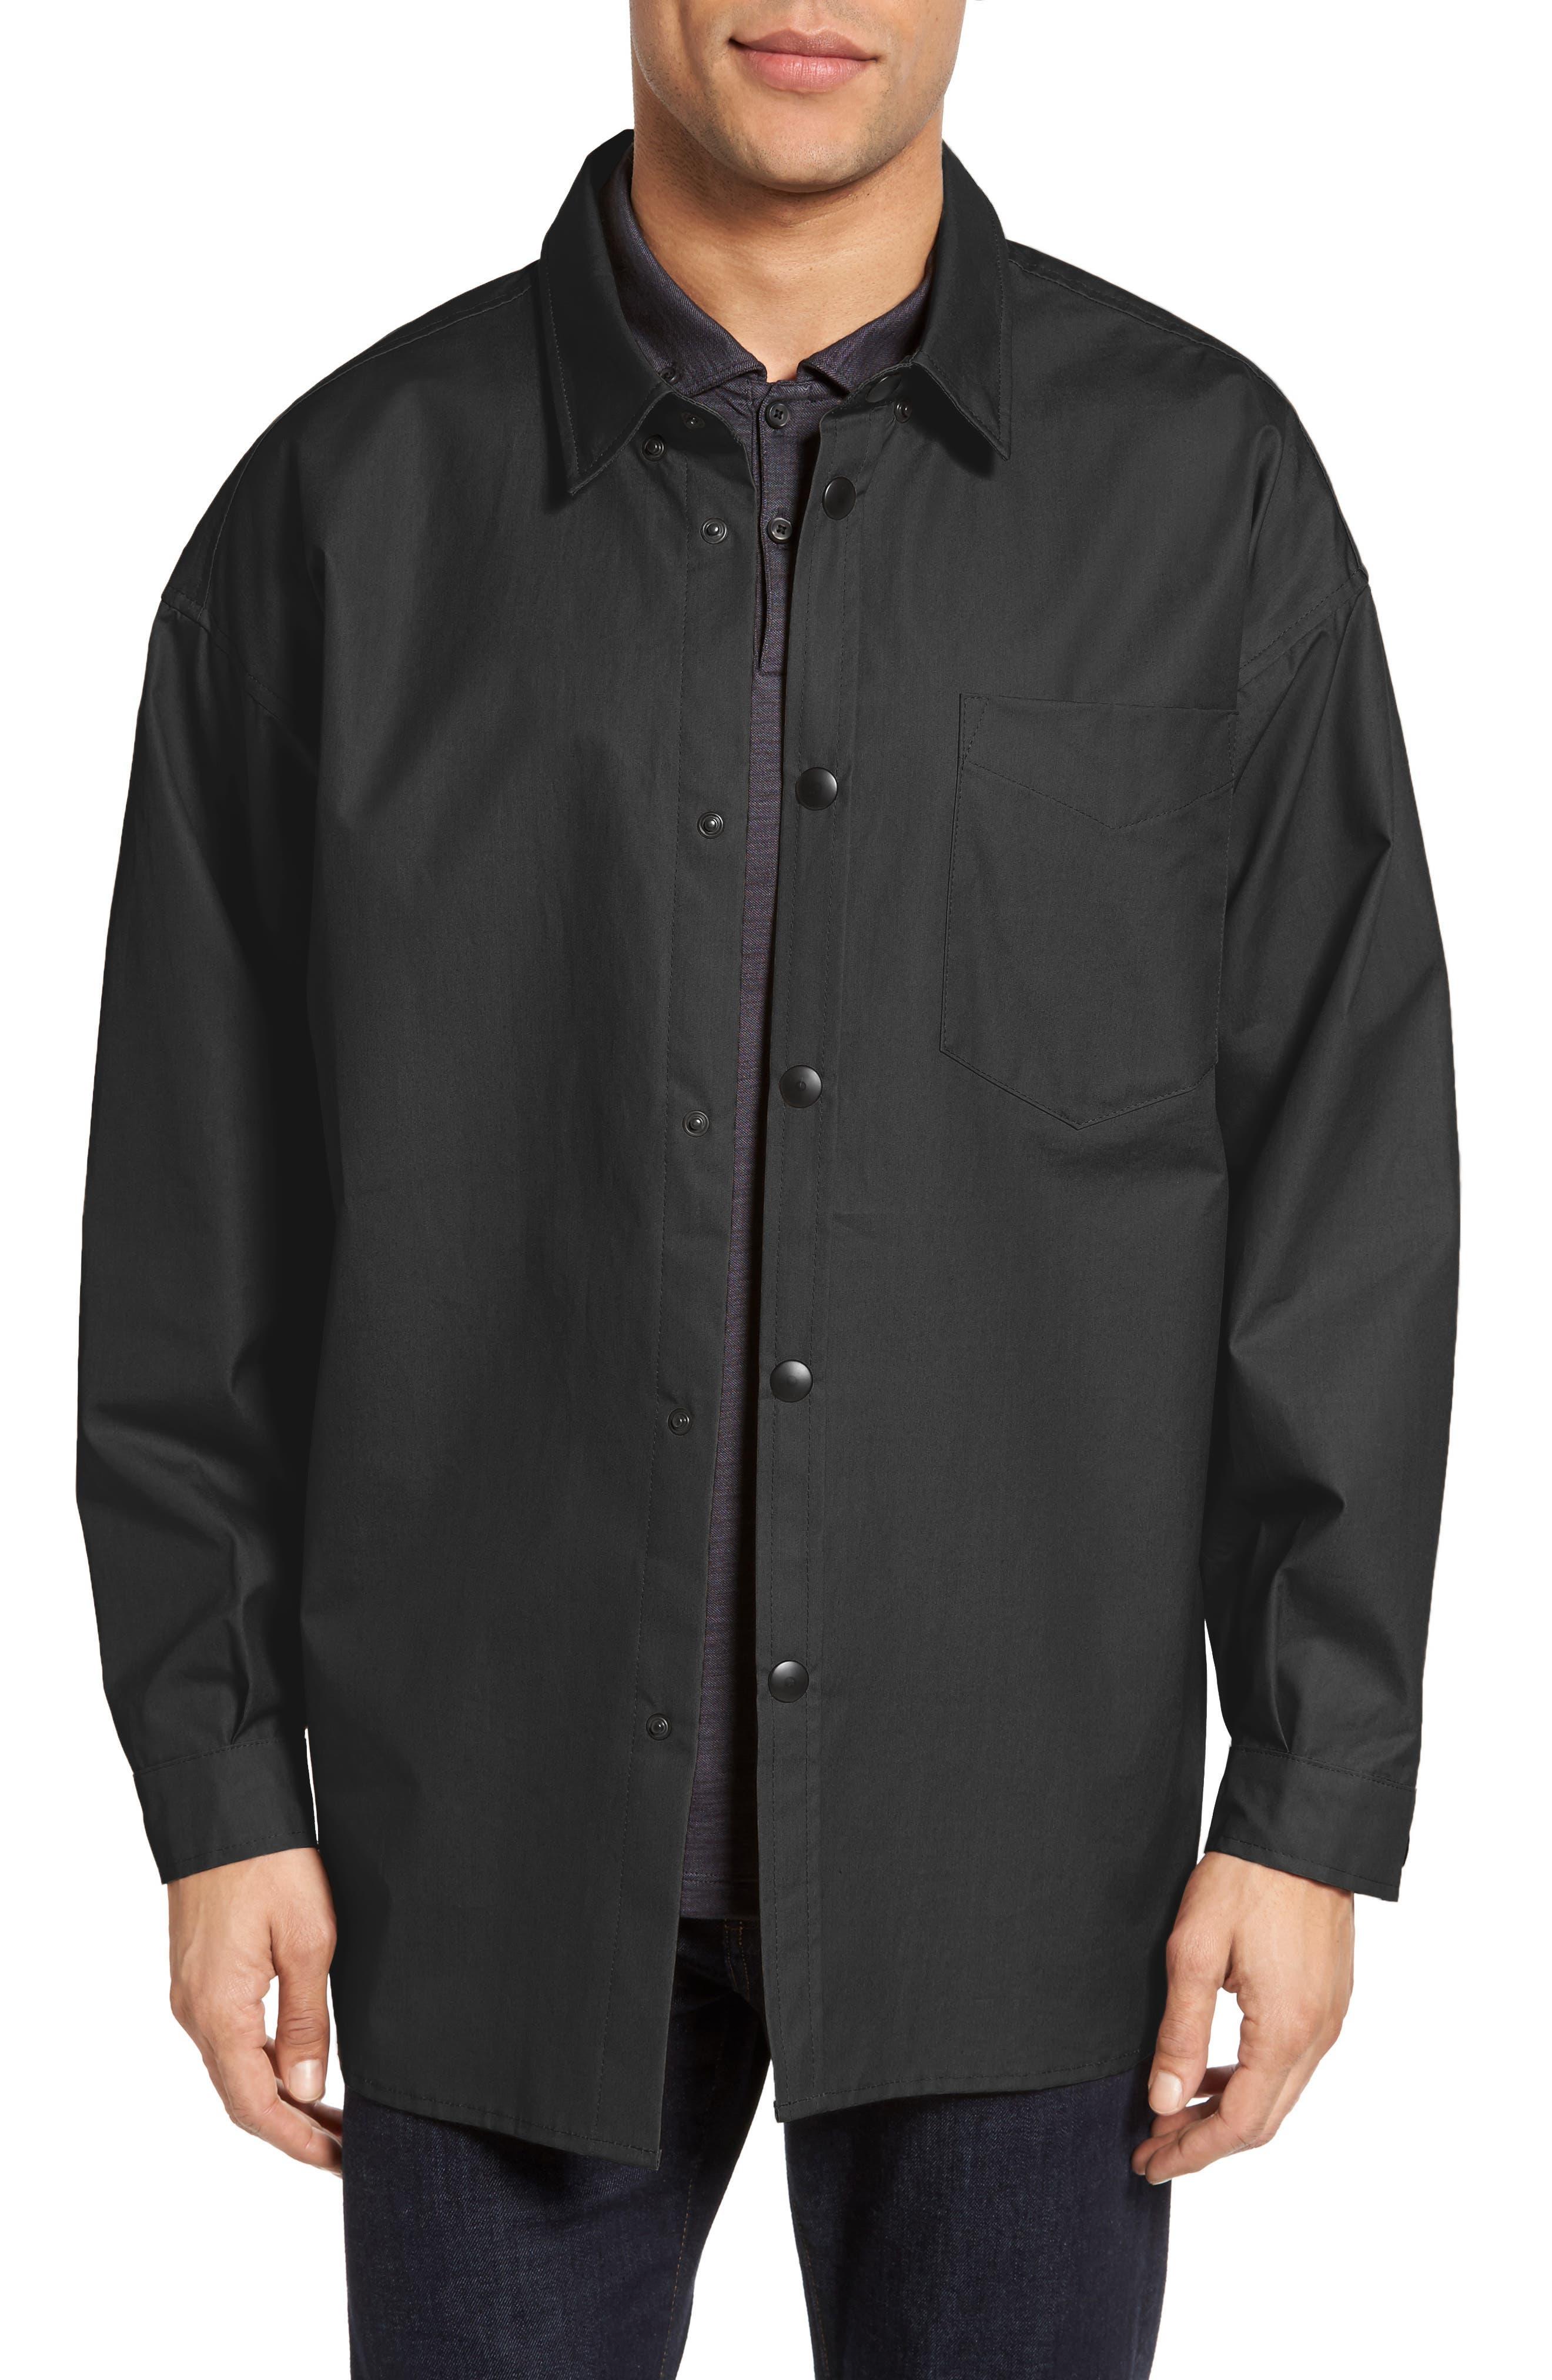 Lerum Relaxed Fit Shirt Jacket,                             Main thumbnail 1, color,                             001